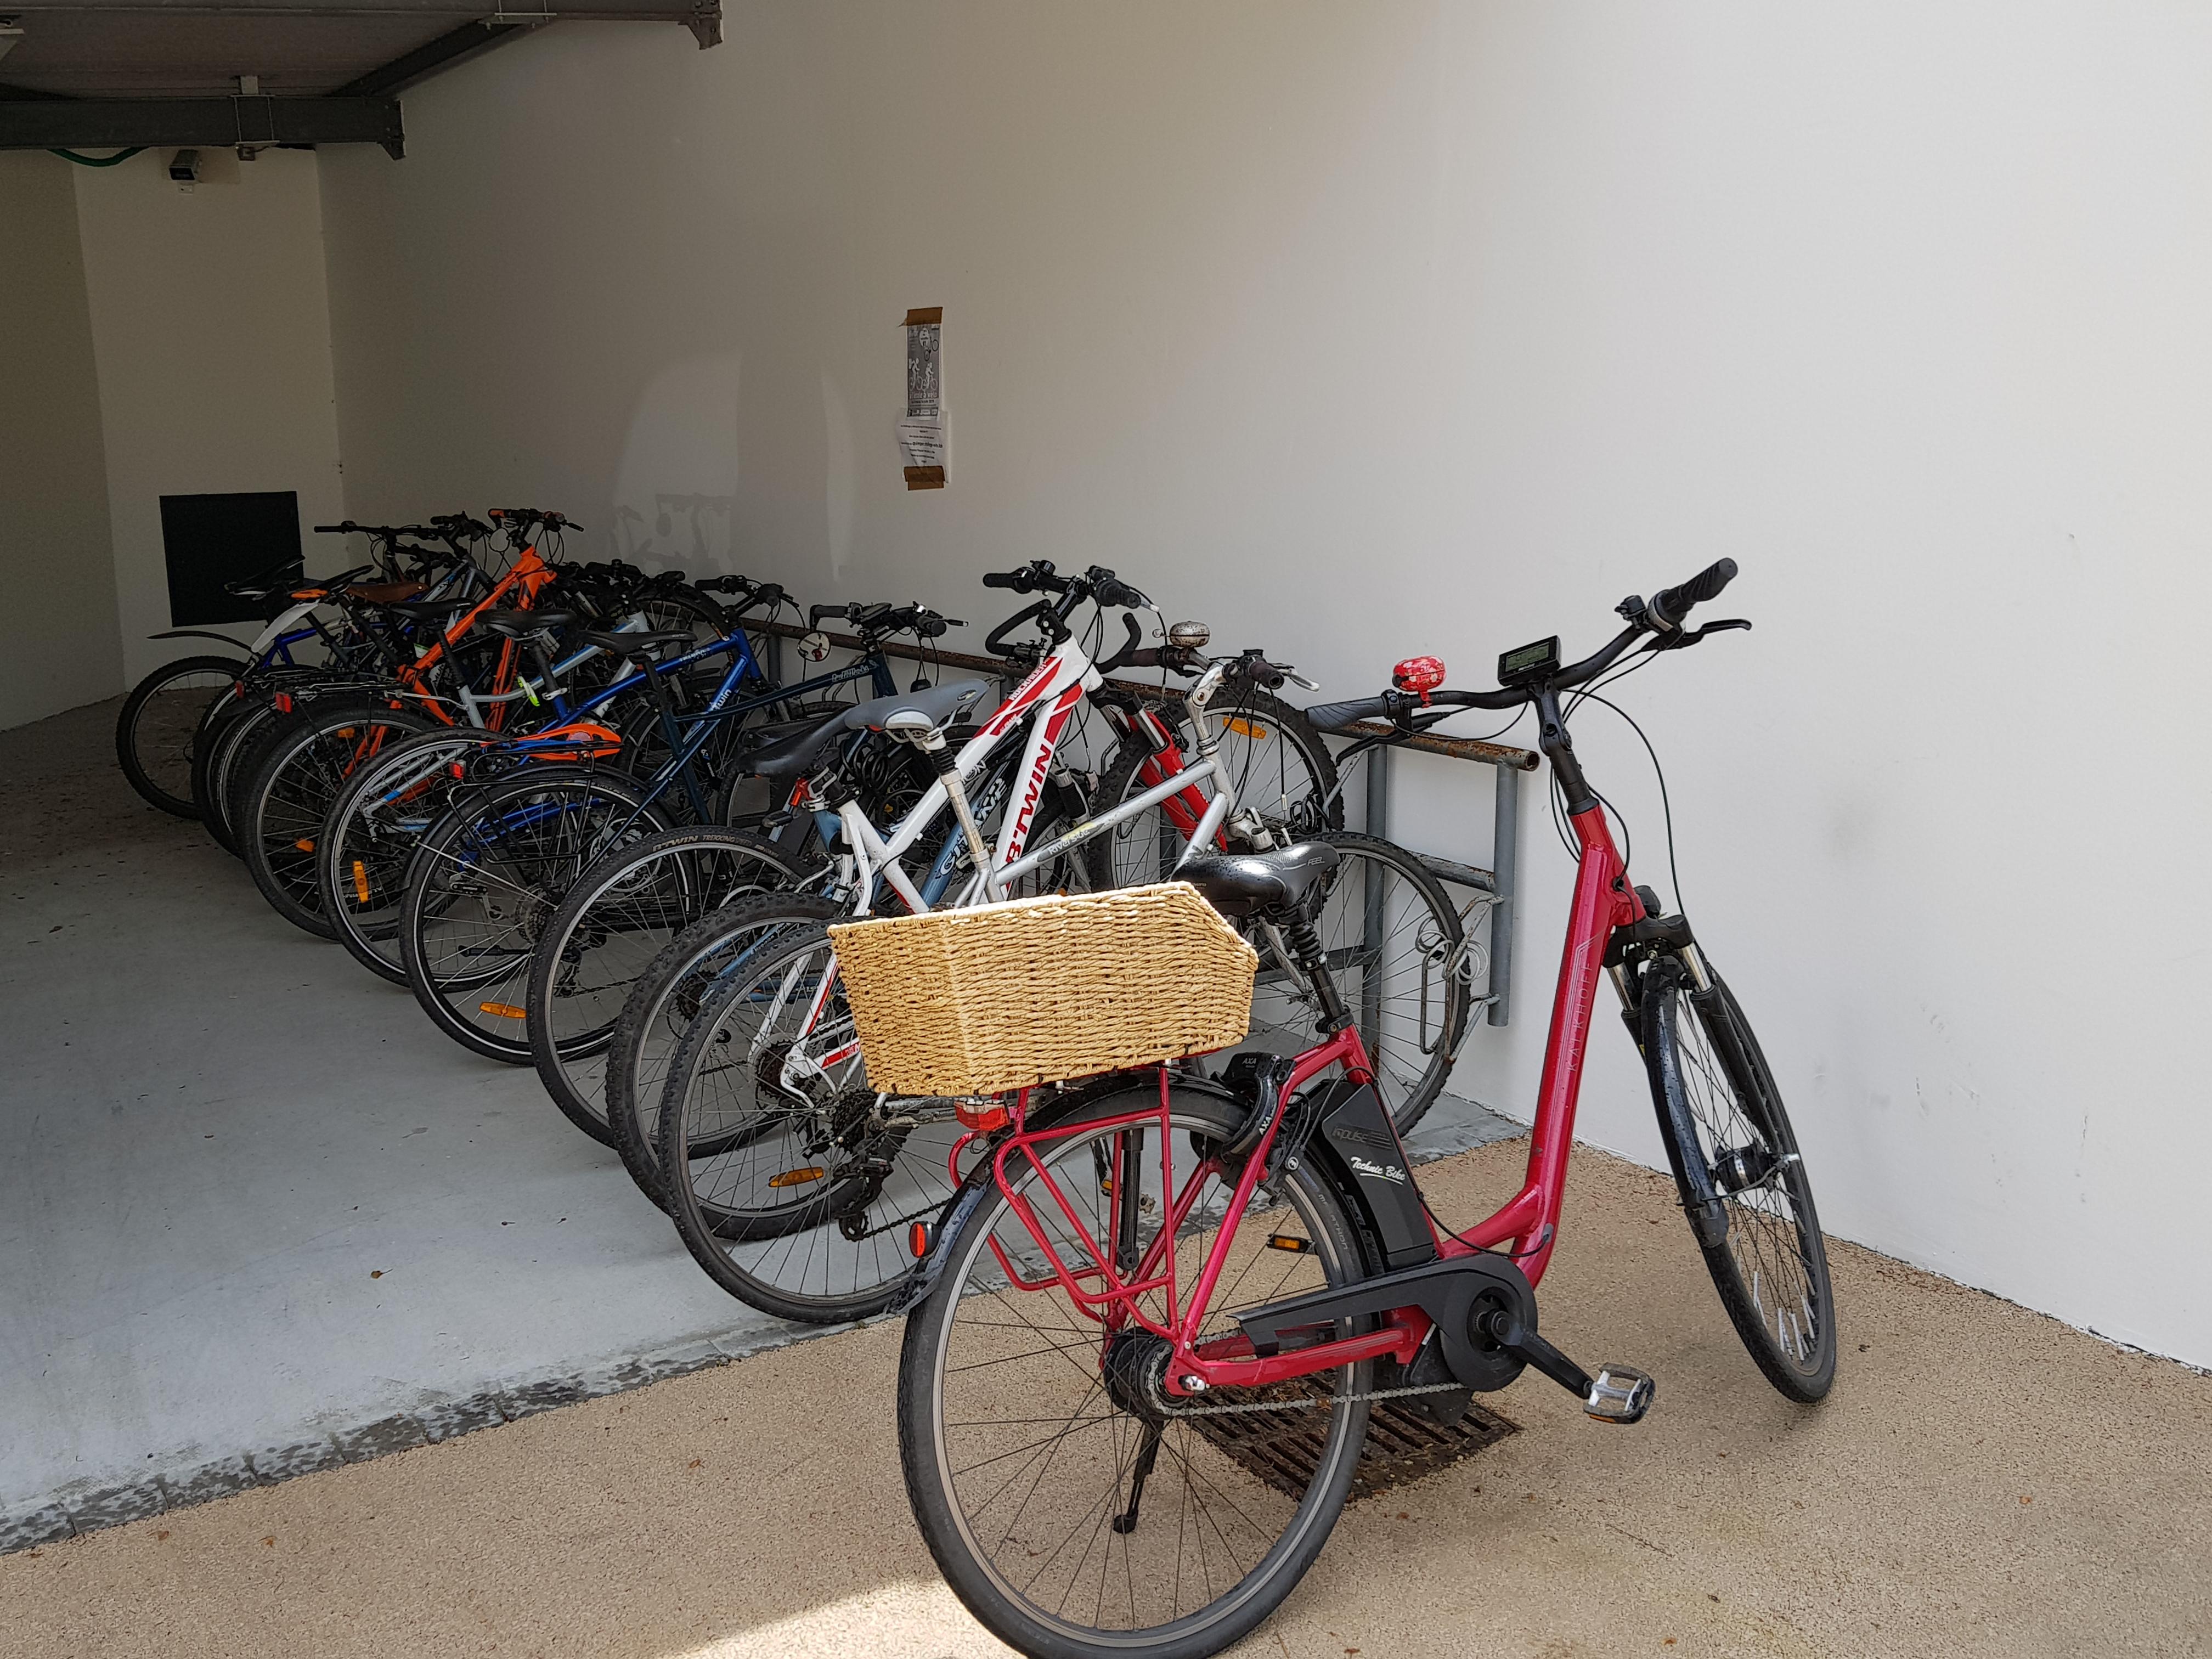 Germain Levry – Garage à Vélo